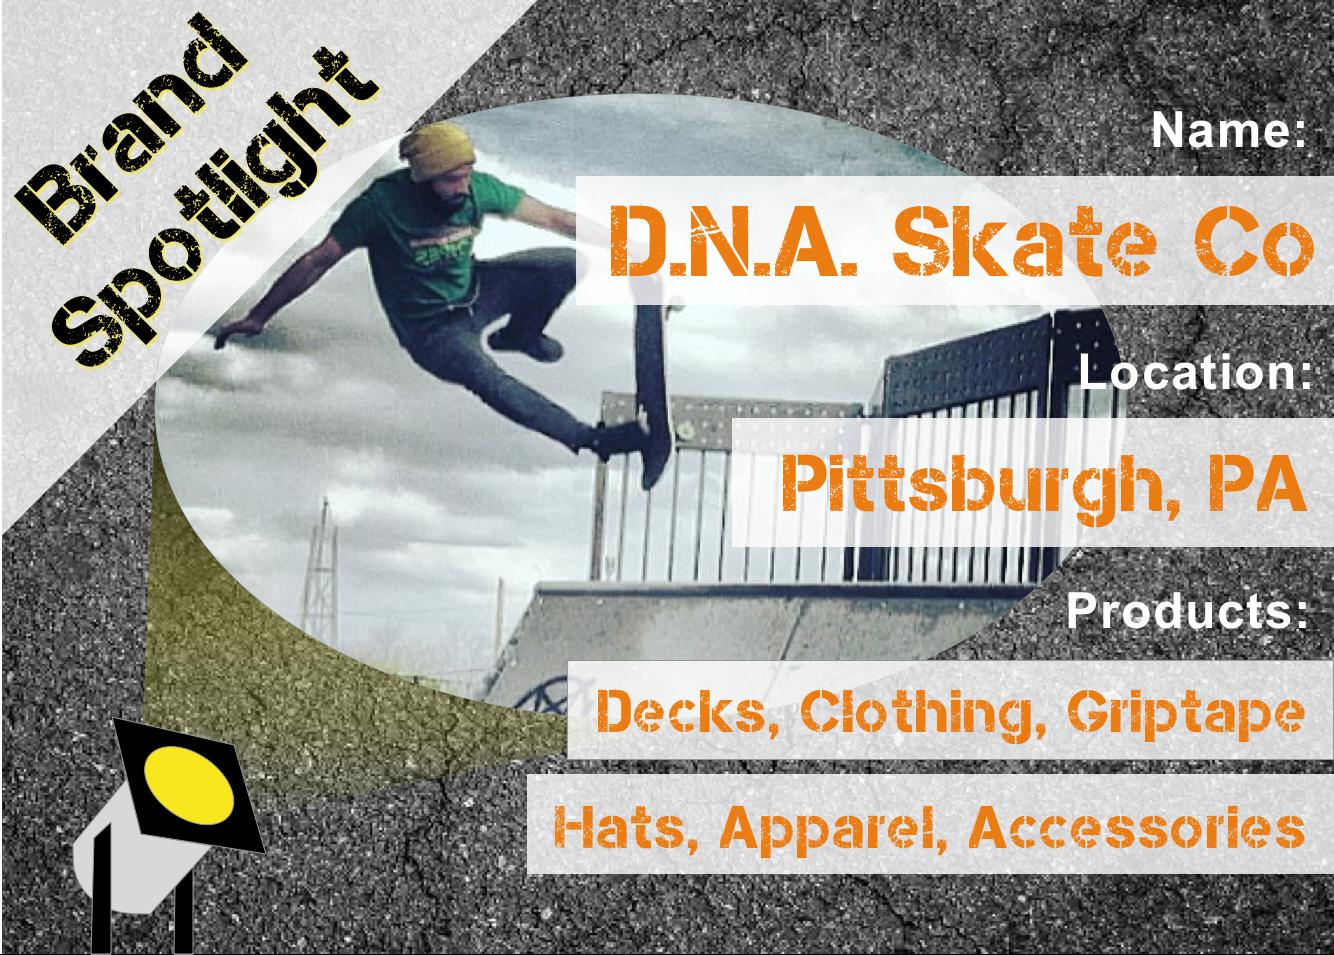 dna-skate-co-brand-spotlight.png